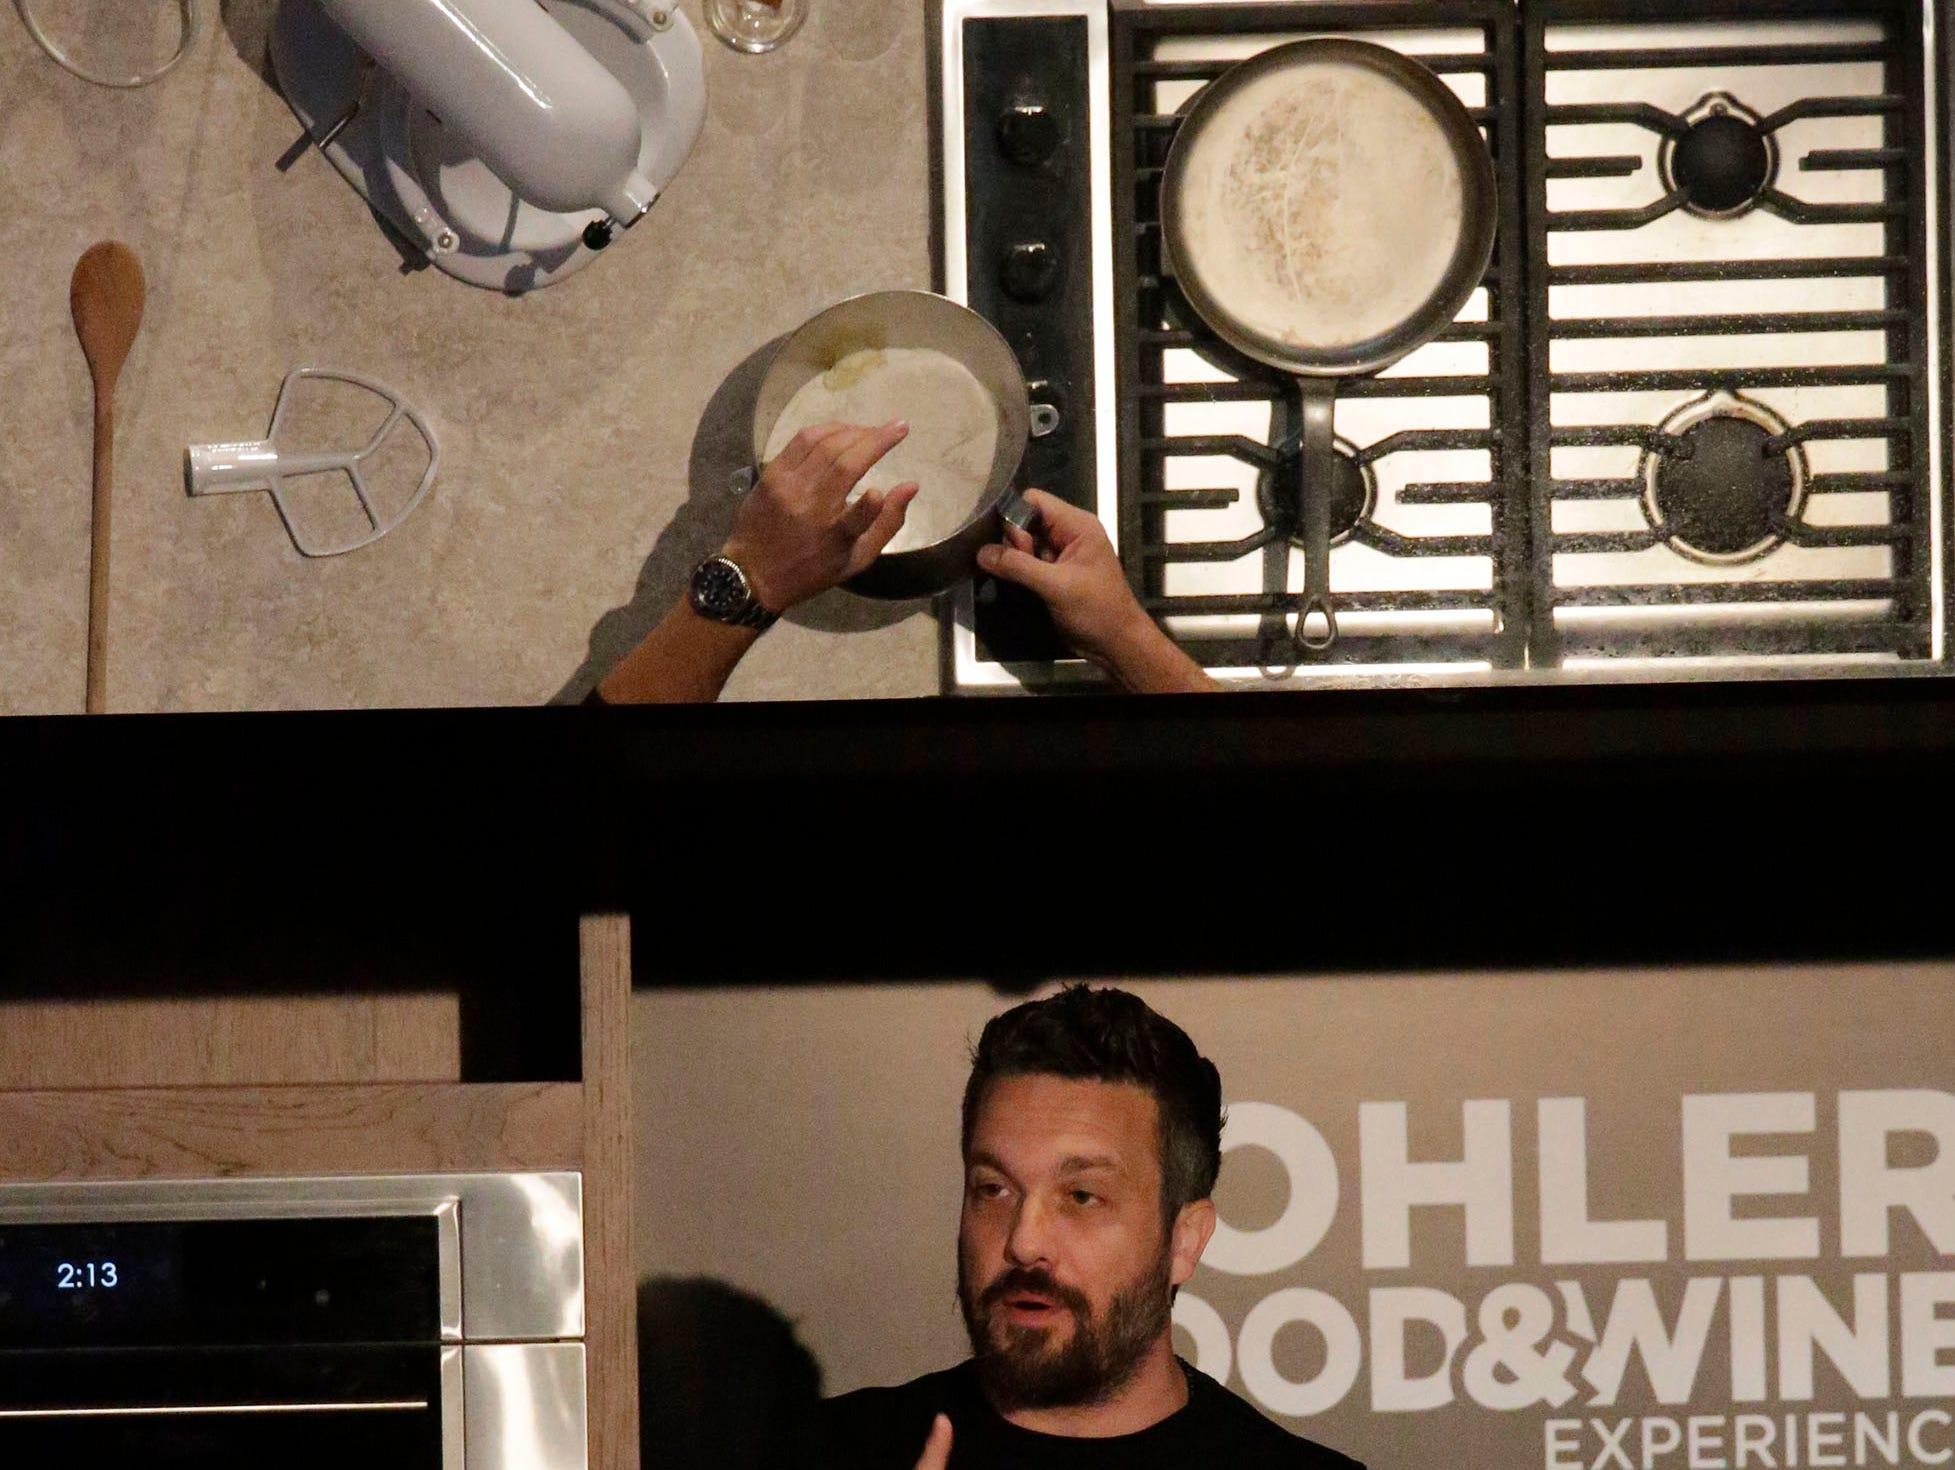 Celebrity chef Fabio Viviani explains his technique at Kohler Food and Wine, Saturday, October 20, 2018, in Kohler, Wis.